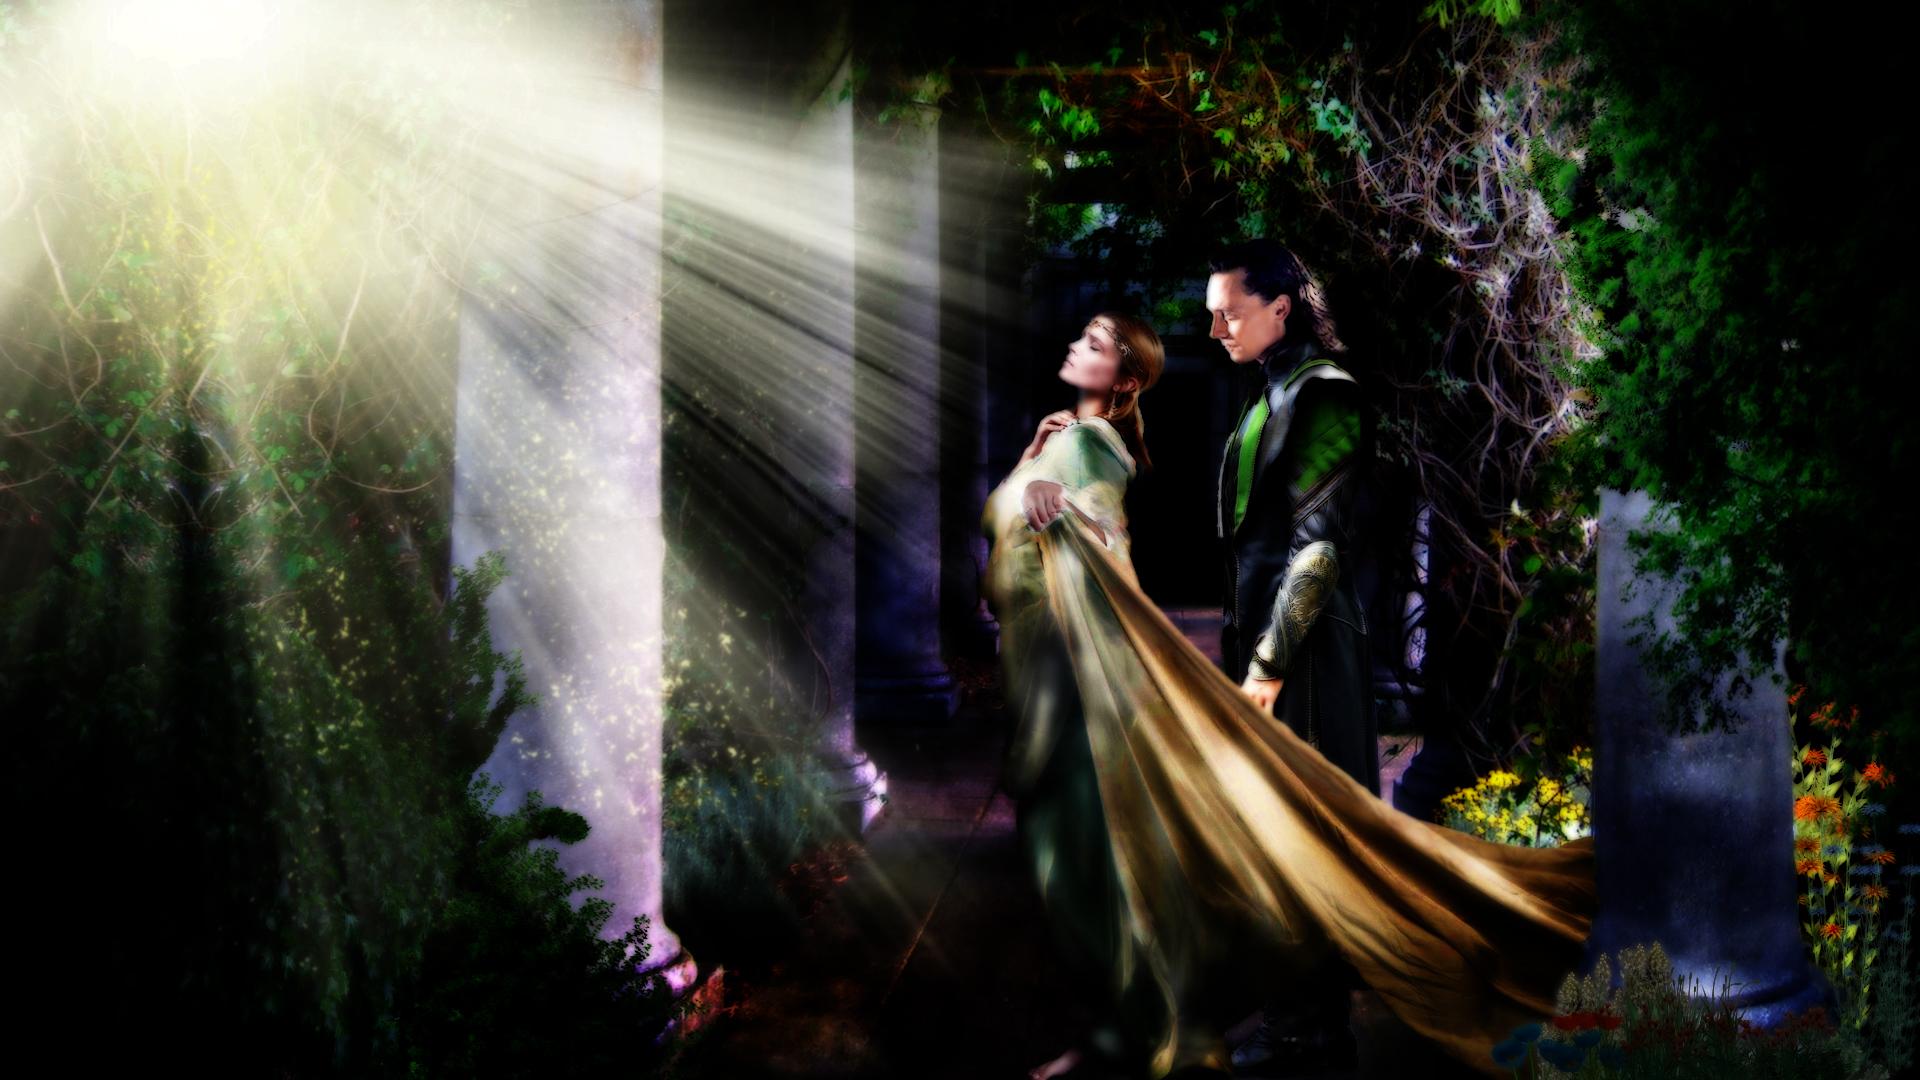 Sad Love Quotes Hd Wallpapers 1080p Hd Loki Backgrounds Pixelstalk Net